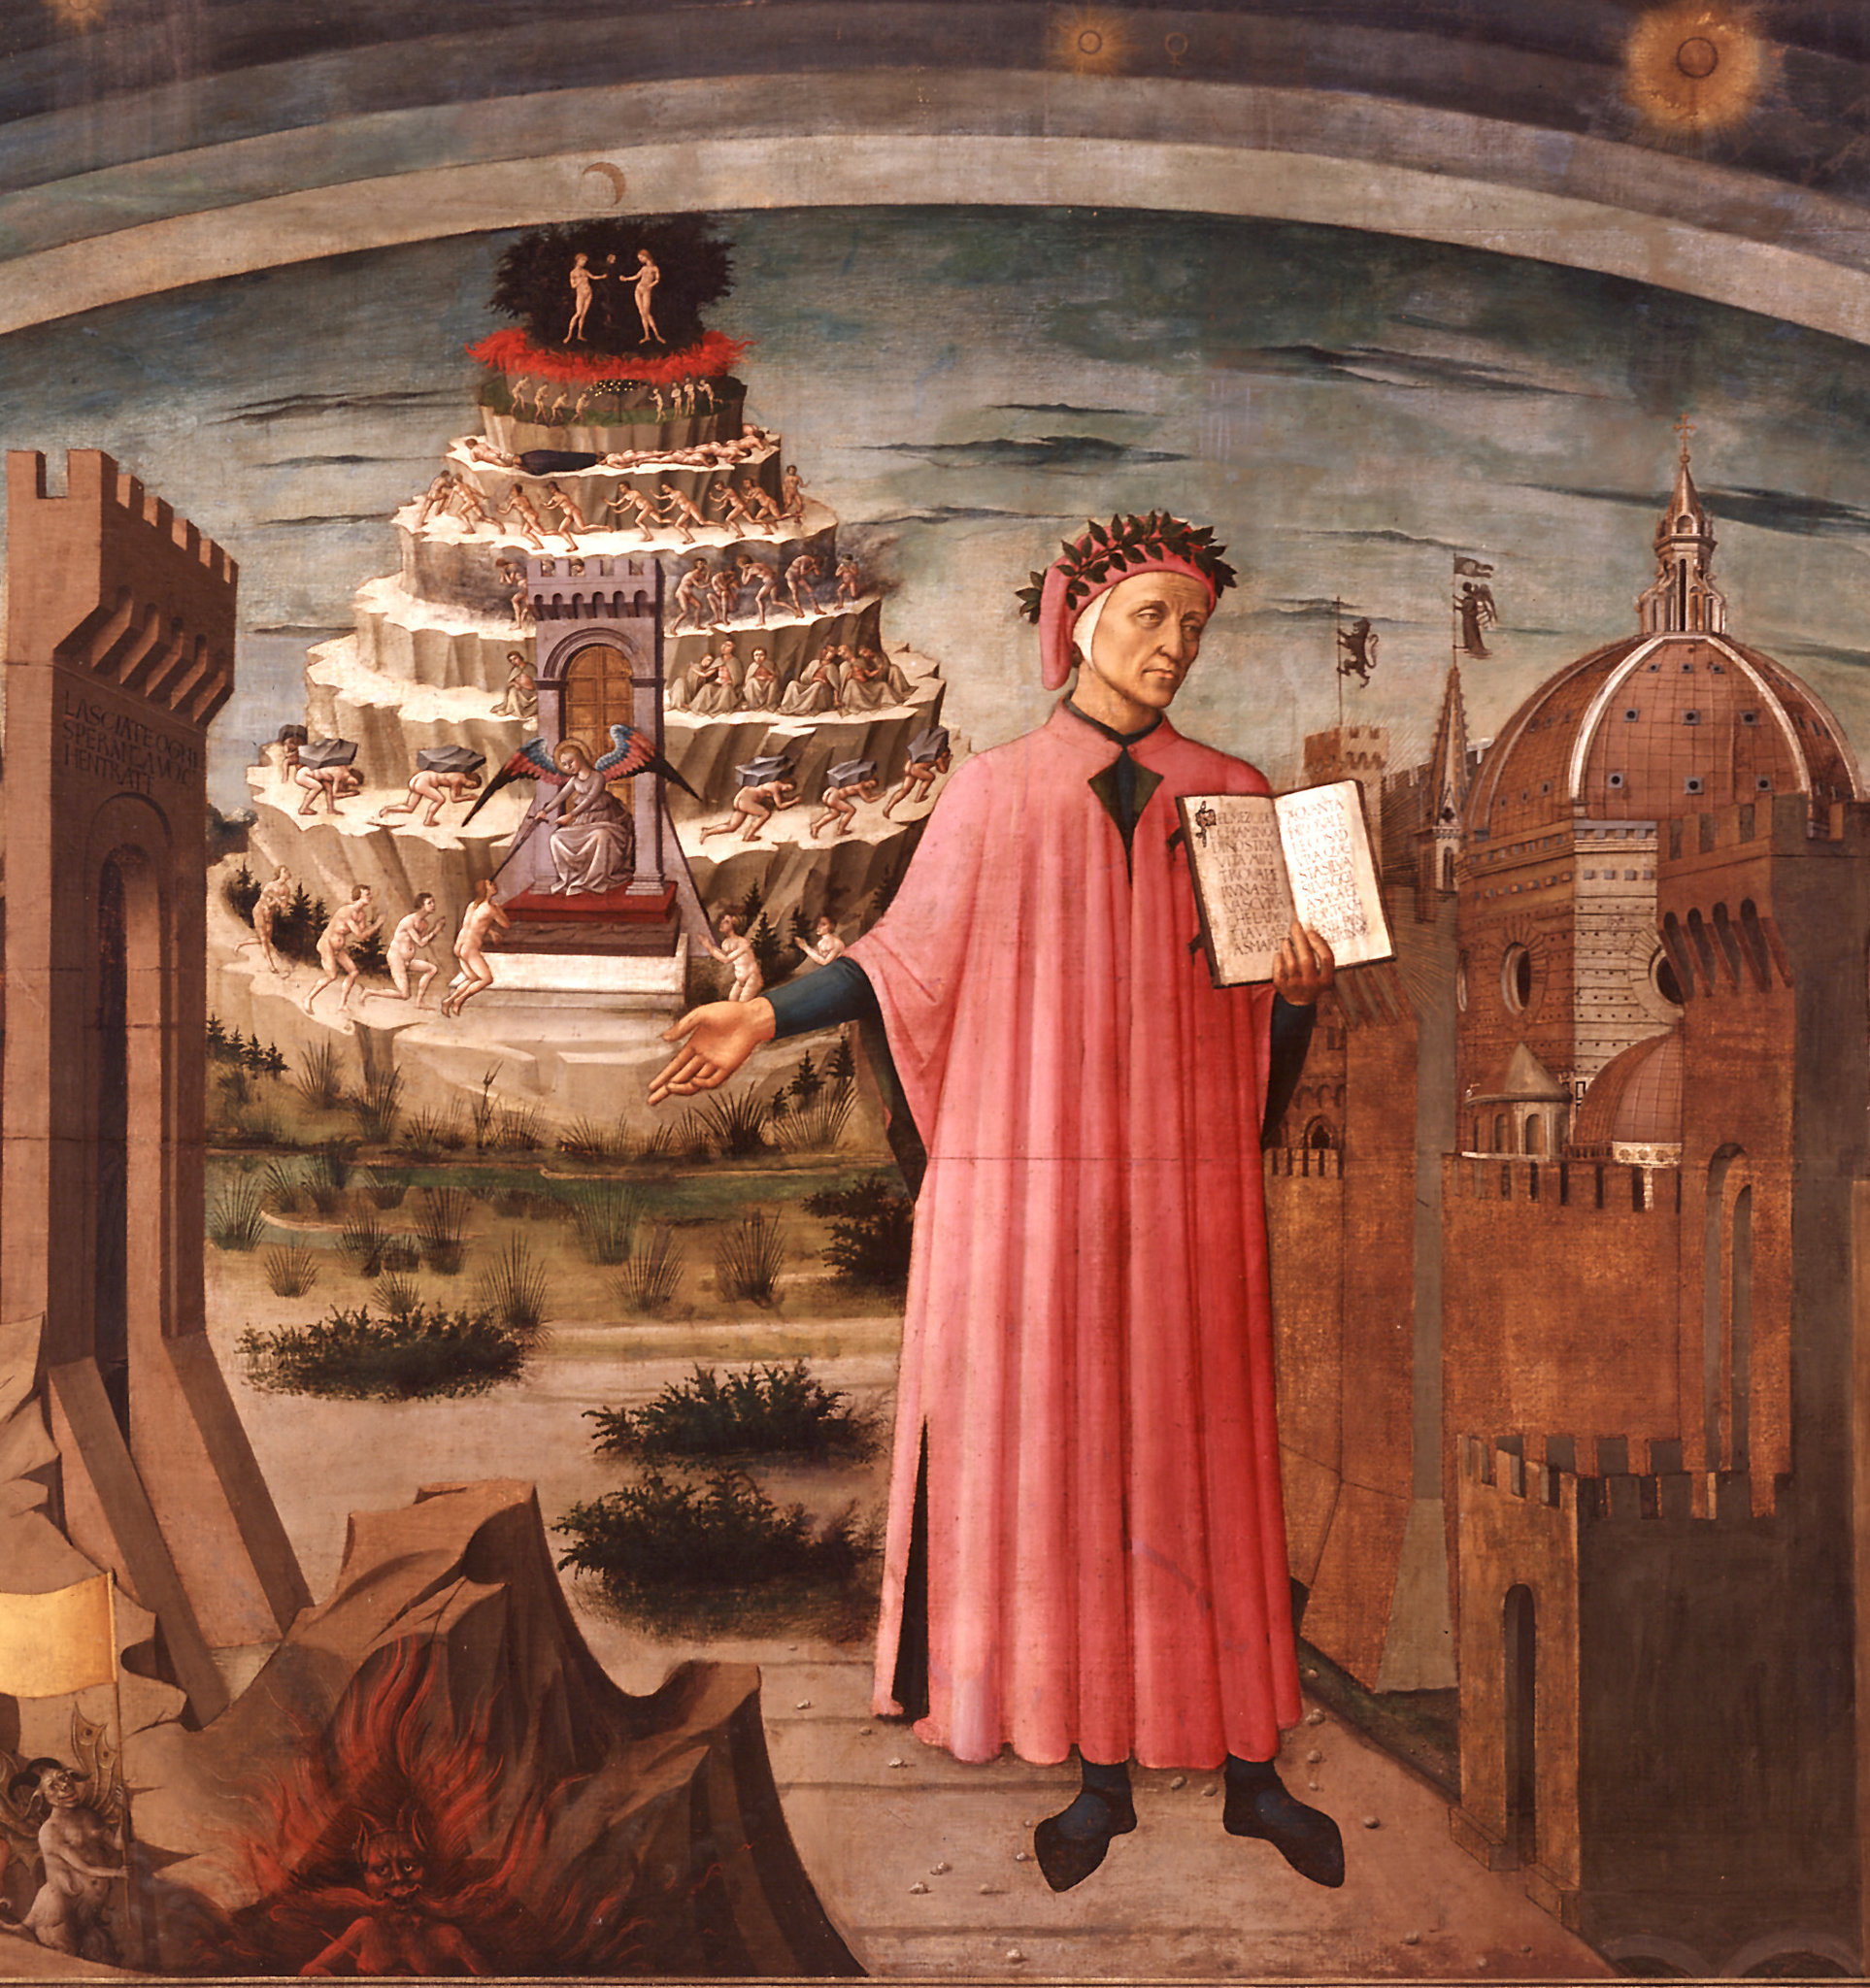 Dante, poised between the mountain of purgatory and the city of Florence, displays the incipit 'Nel mezzo del cammin di nostra vita' in Domenico di Michelino's painting, Florence, 1465.